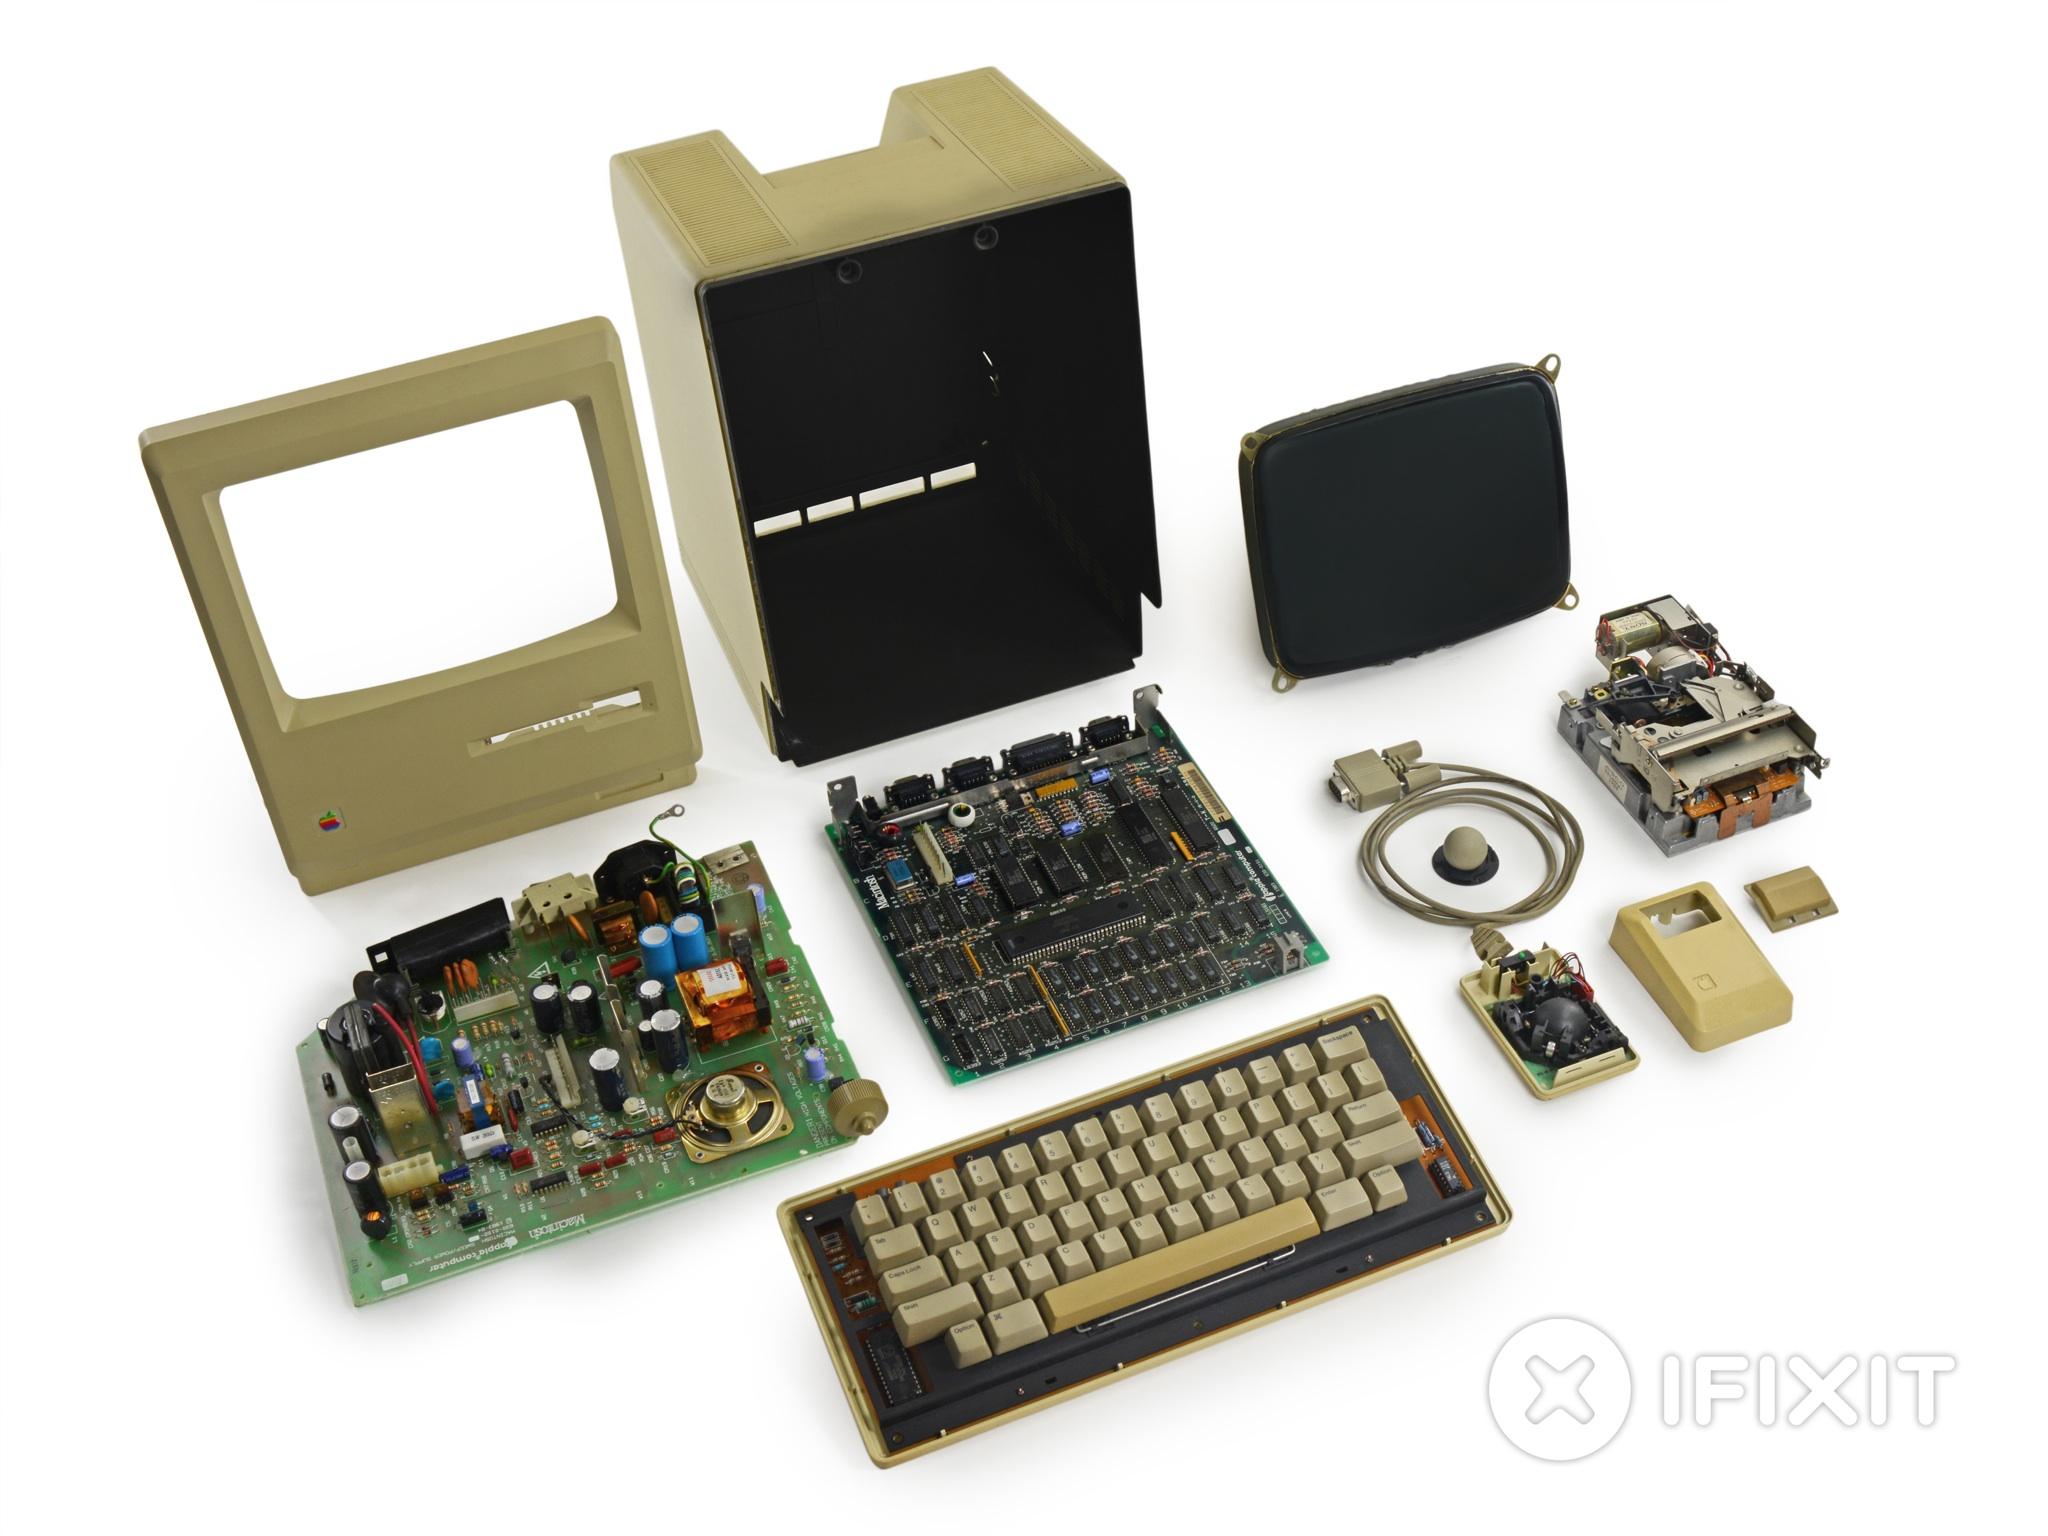 Original Mac teardown (iFixit 001)